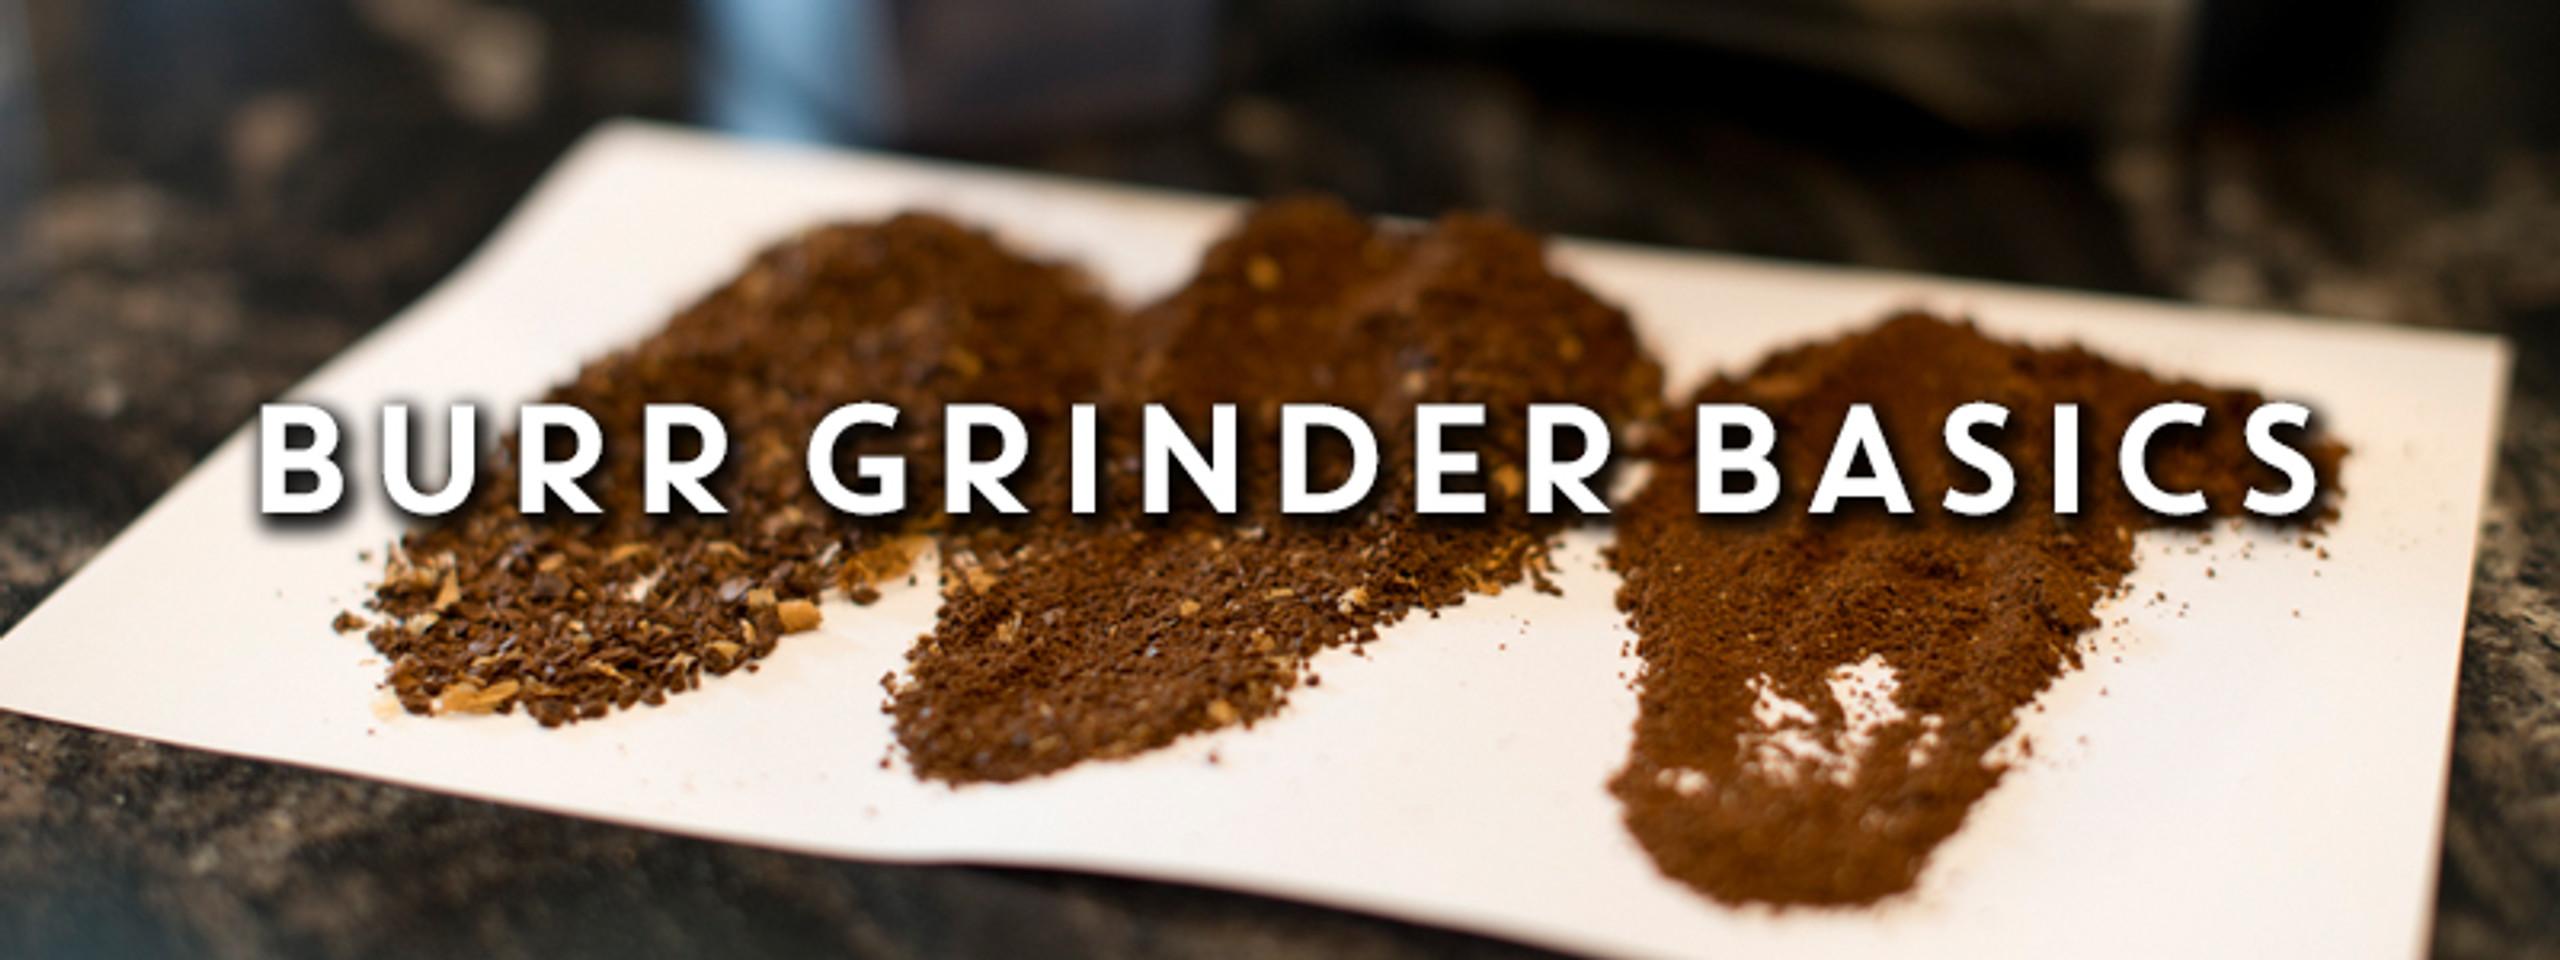 Burr Grinder Basics